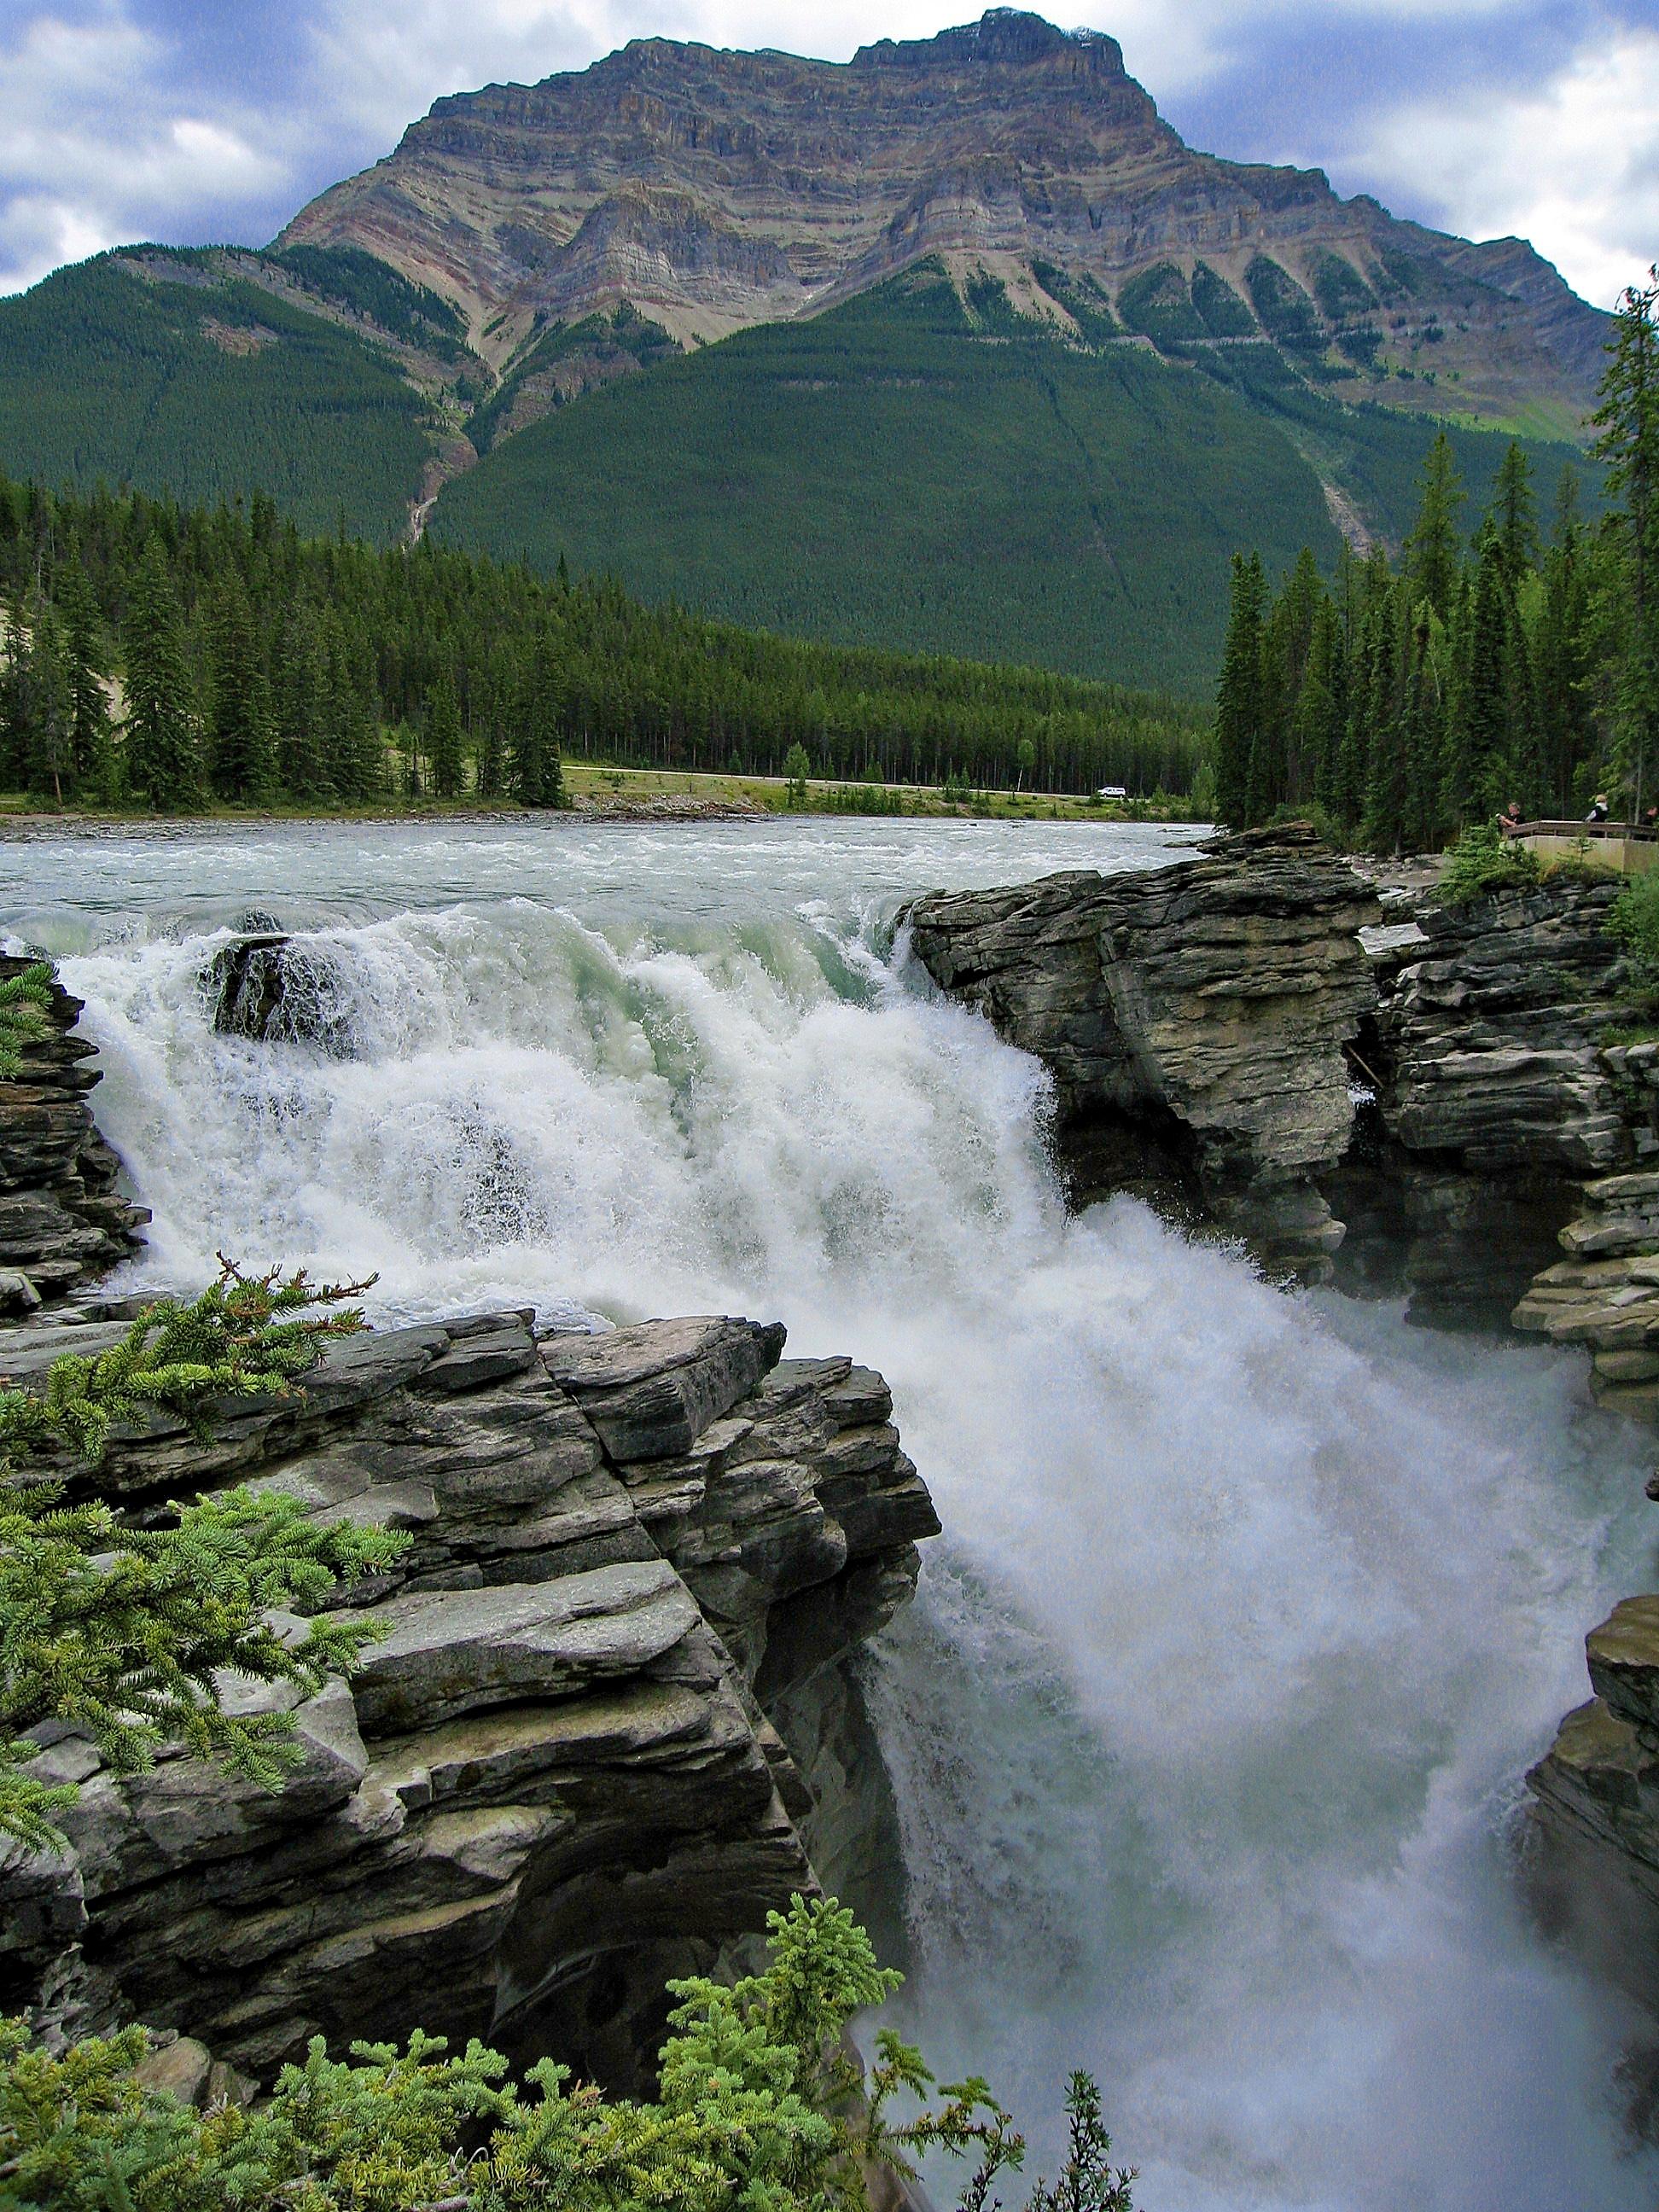 Athabasca Falls,  Jasper National Park, Canada.